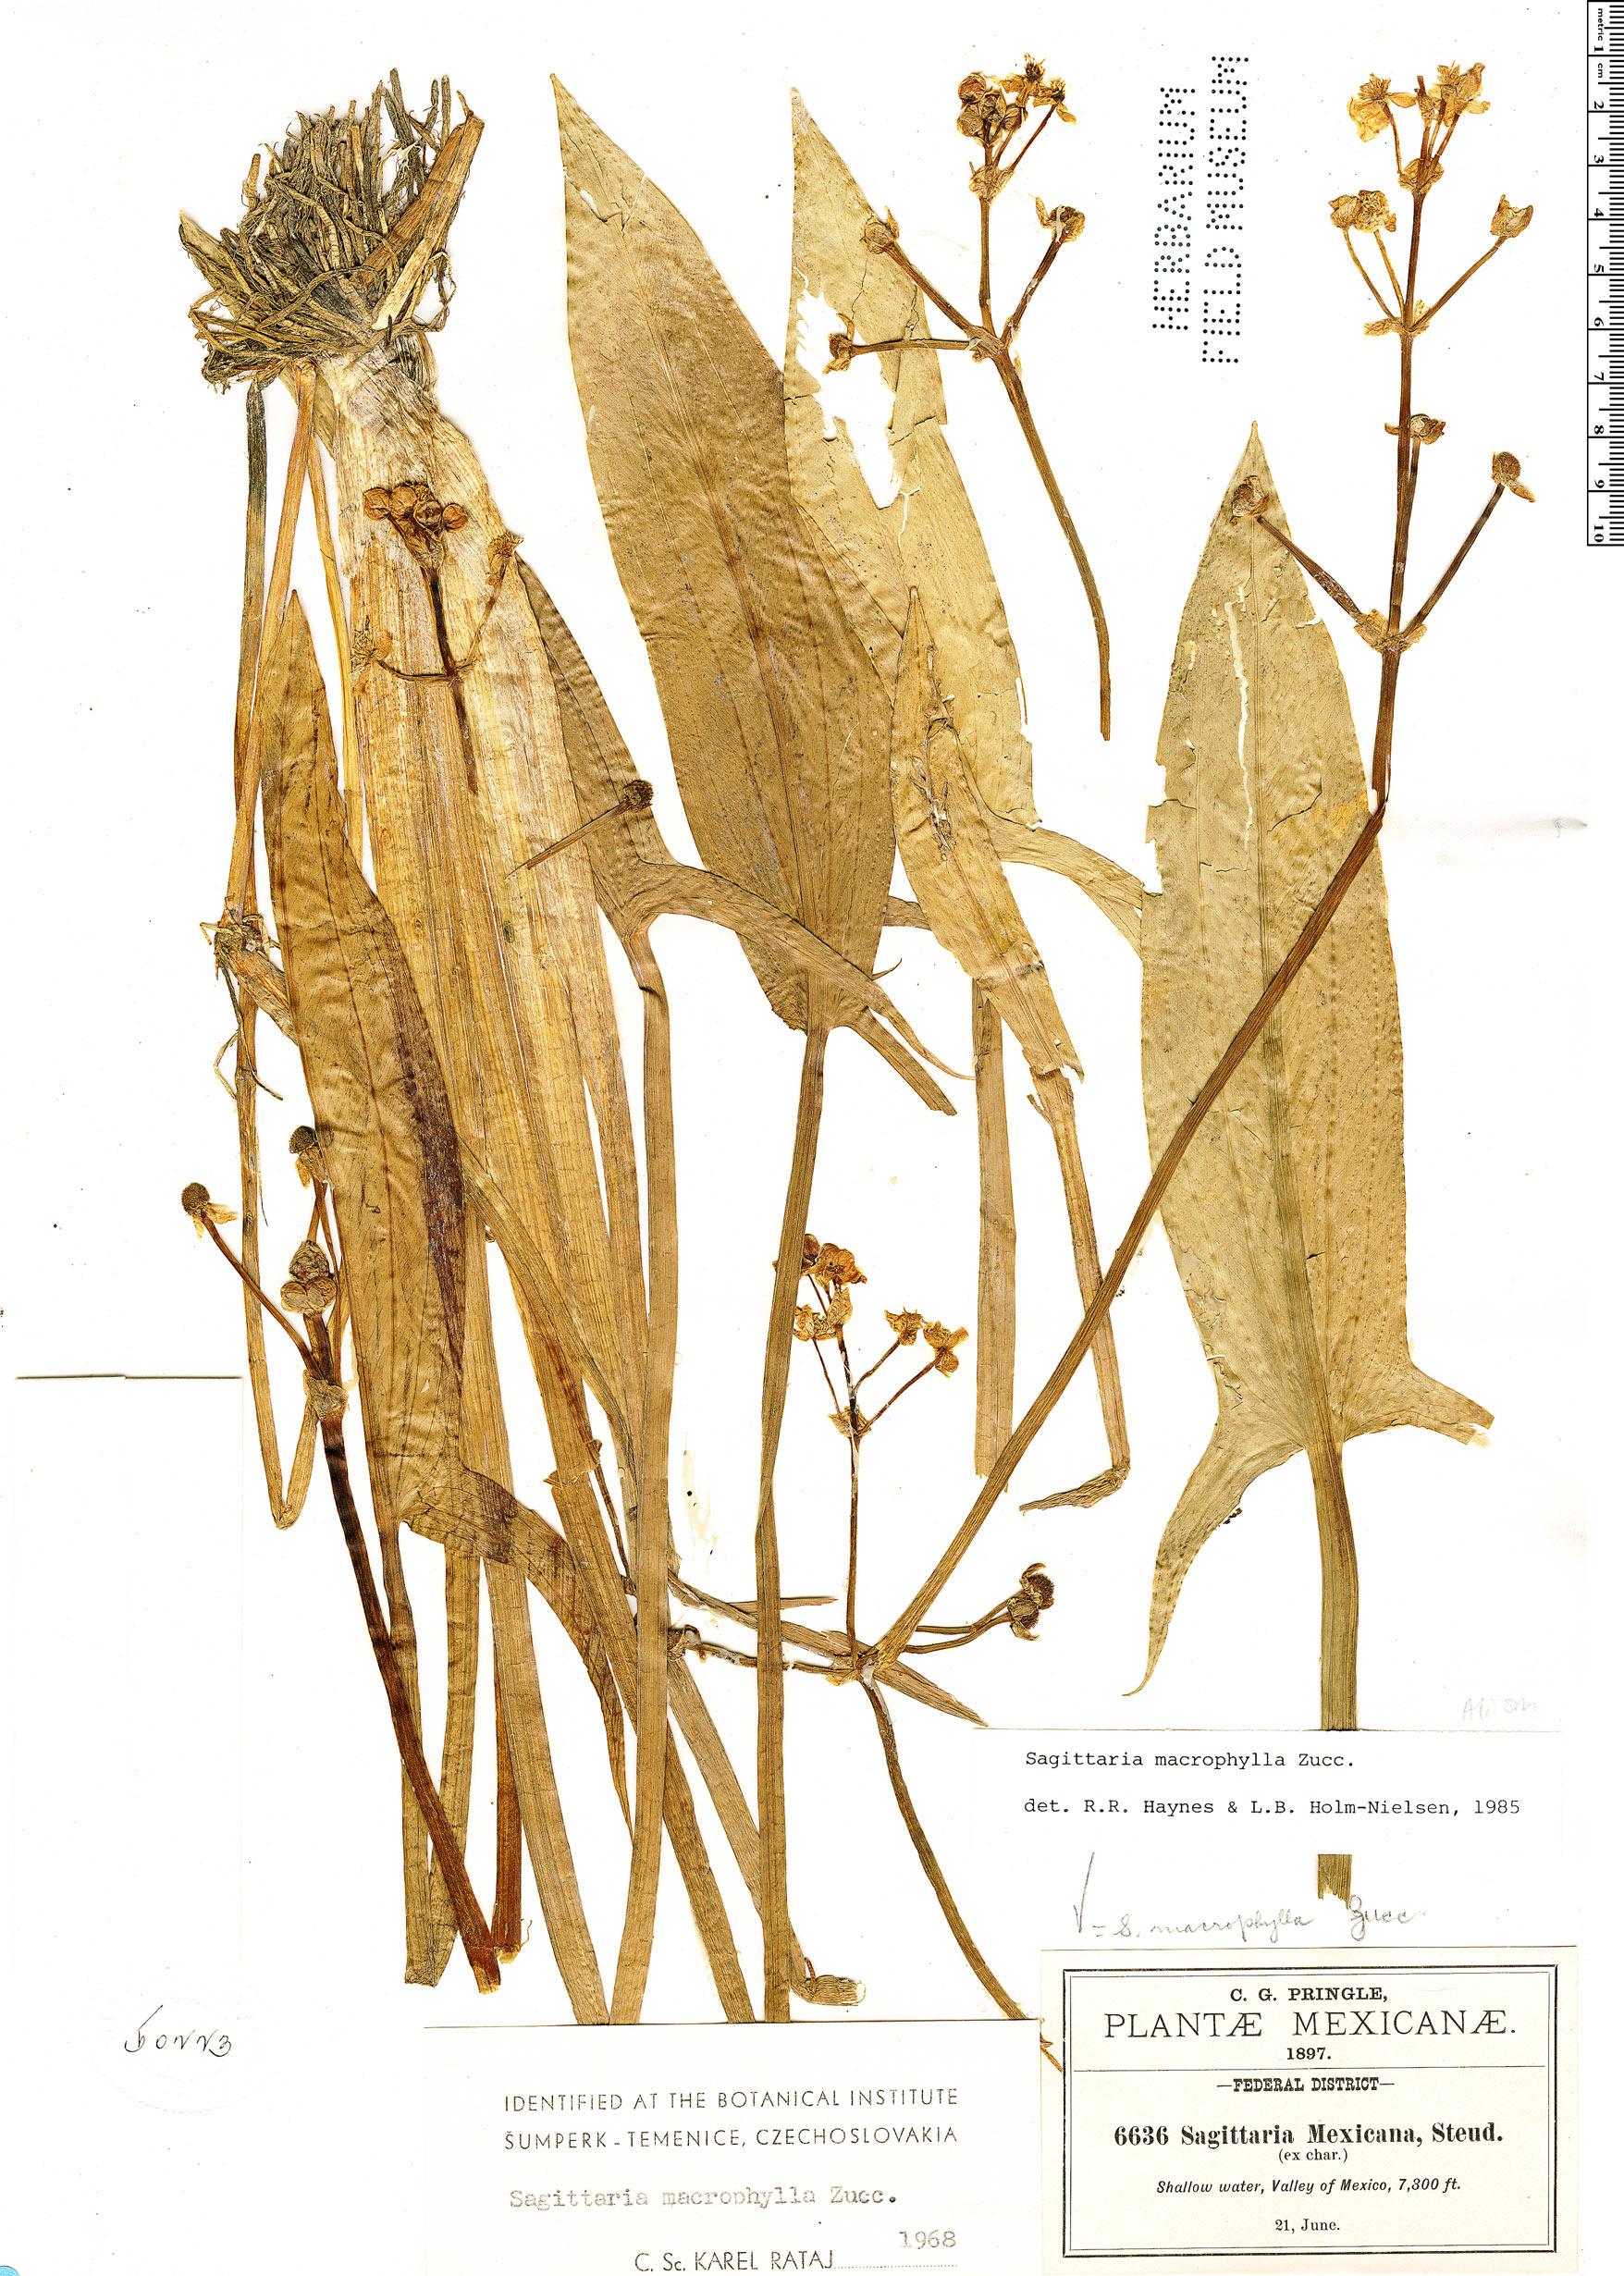 Specimen: Sagittaria macrophylla